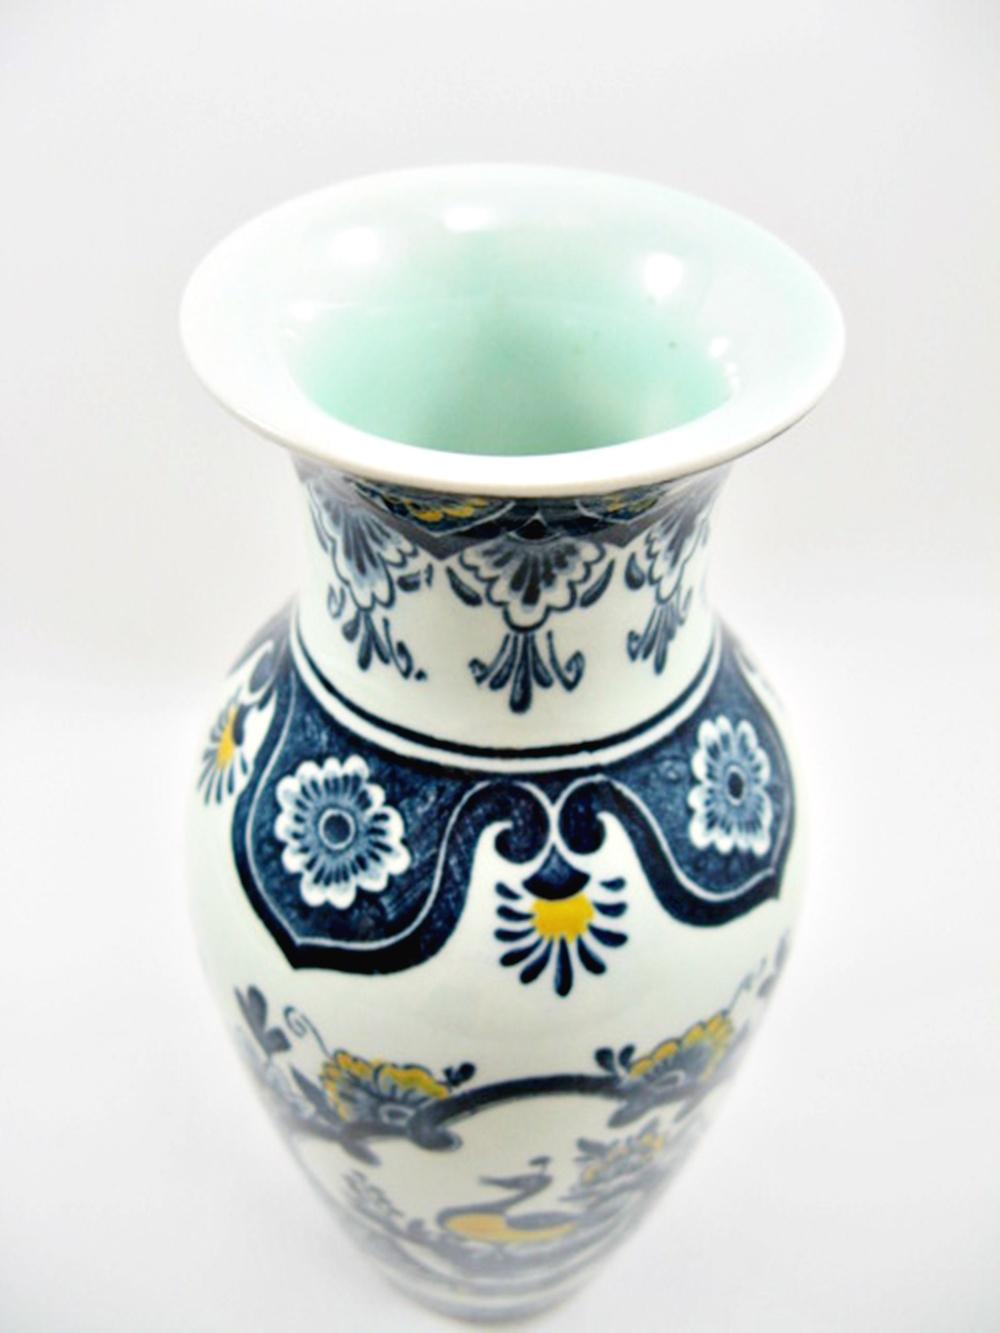 Vase Villeroy Und Boch : villeroy and boch paon vase blue approx 8 cm ~ A.2002-acura-tl-radio.info Haus und Dekorationen